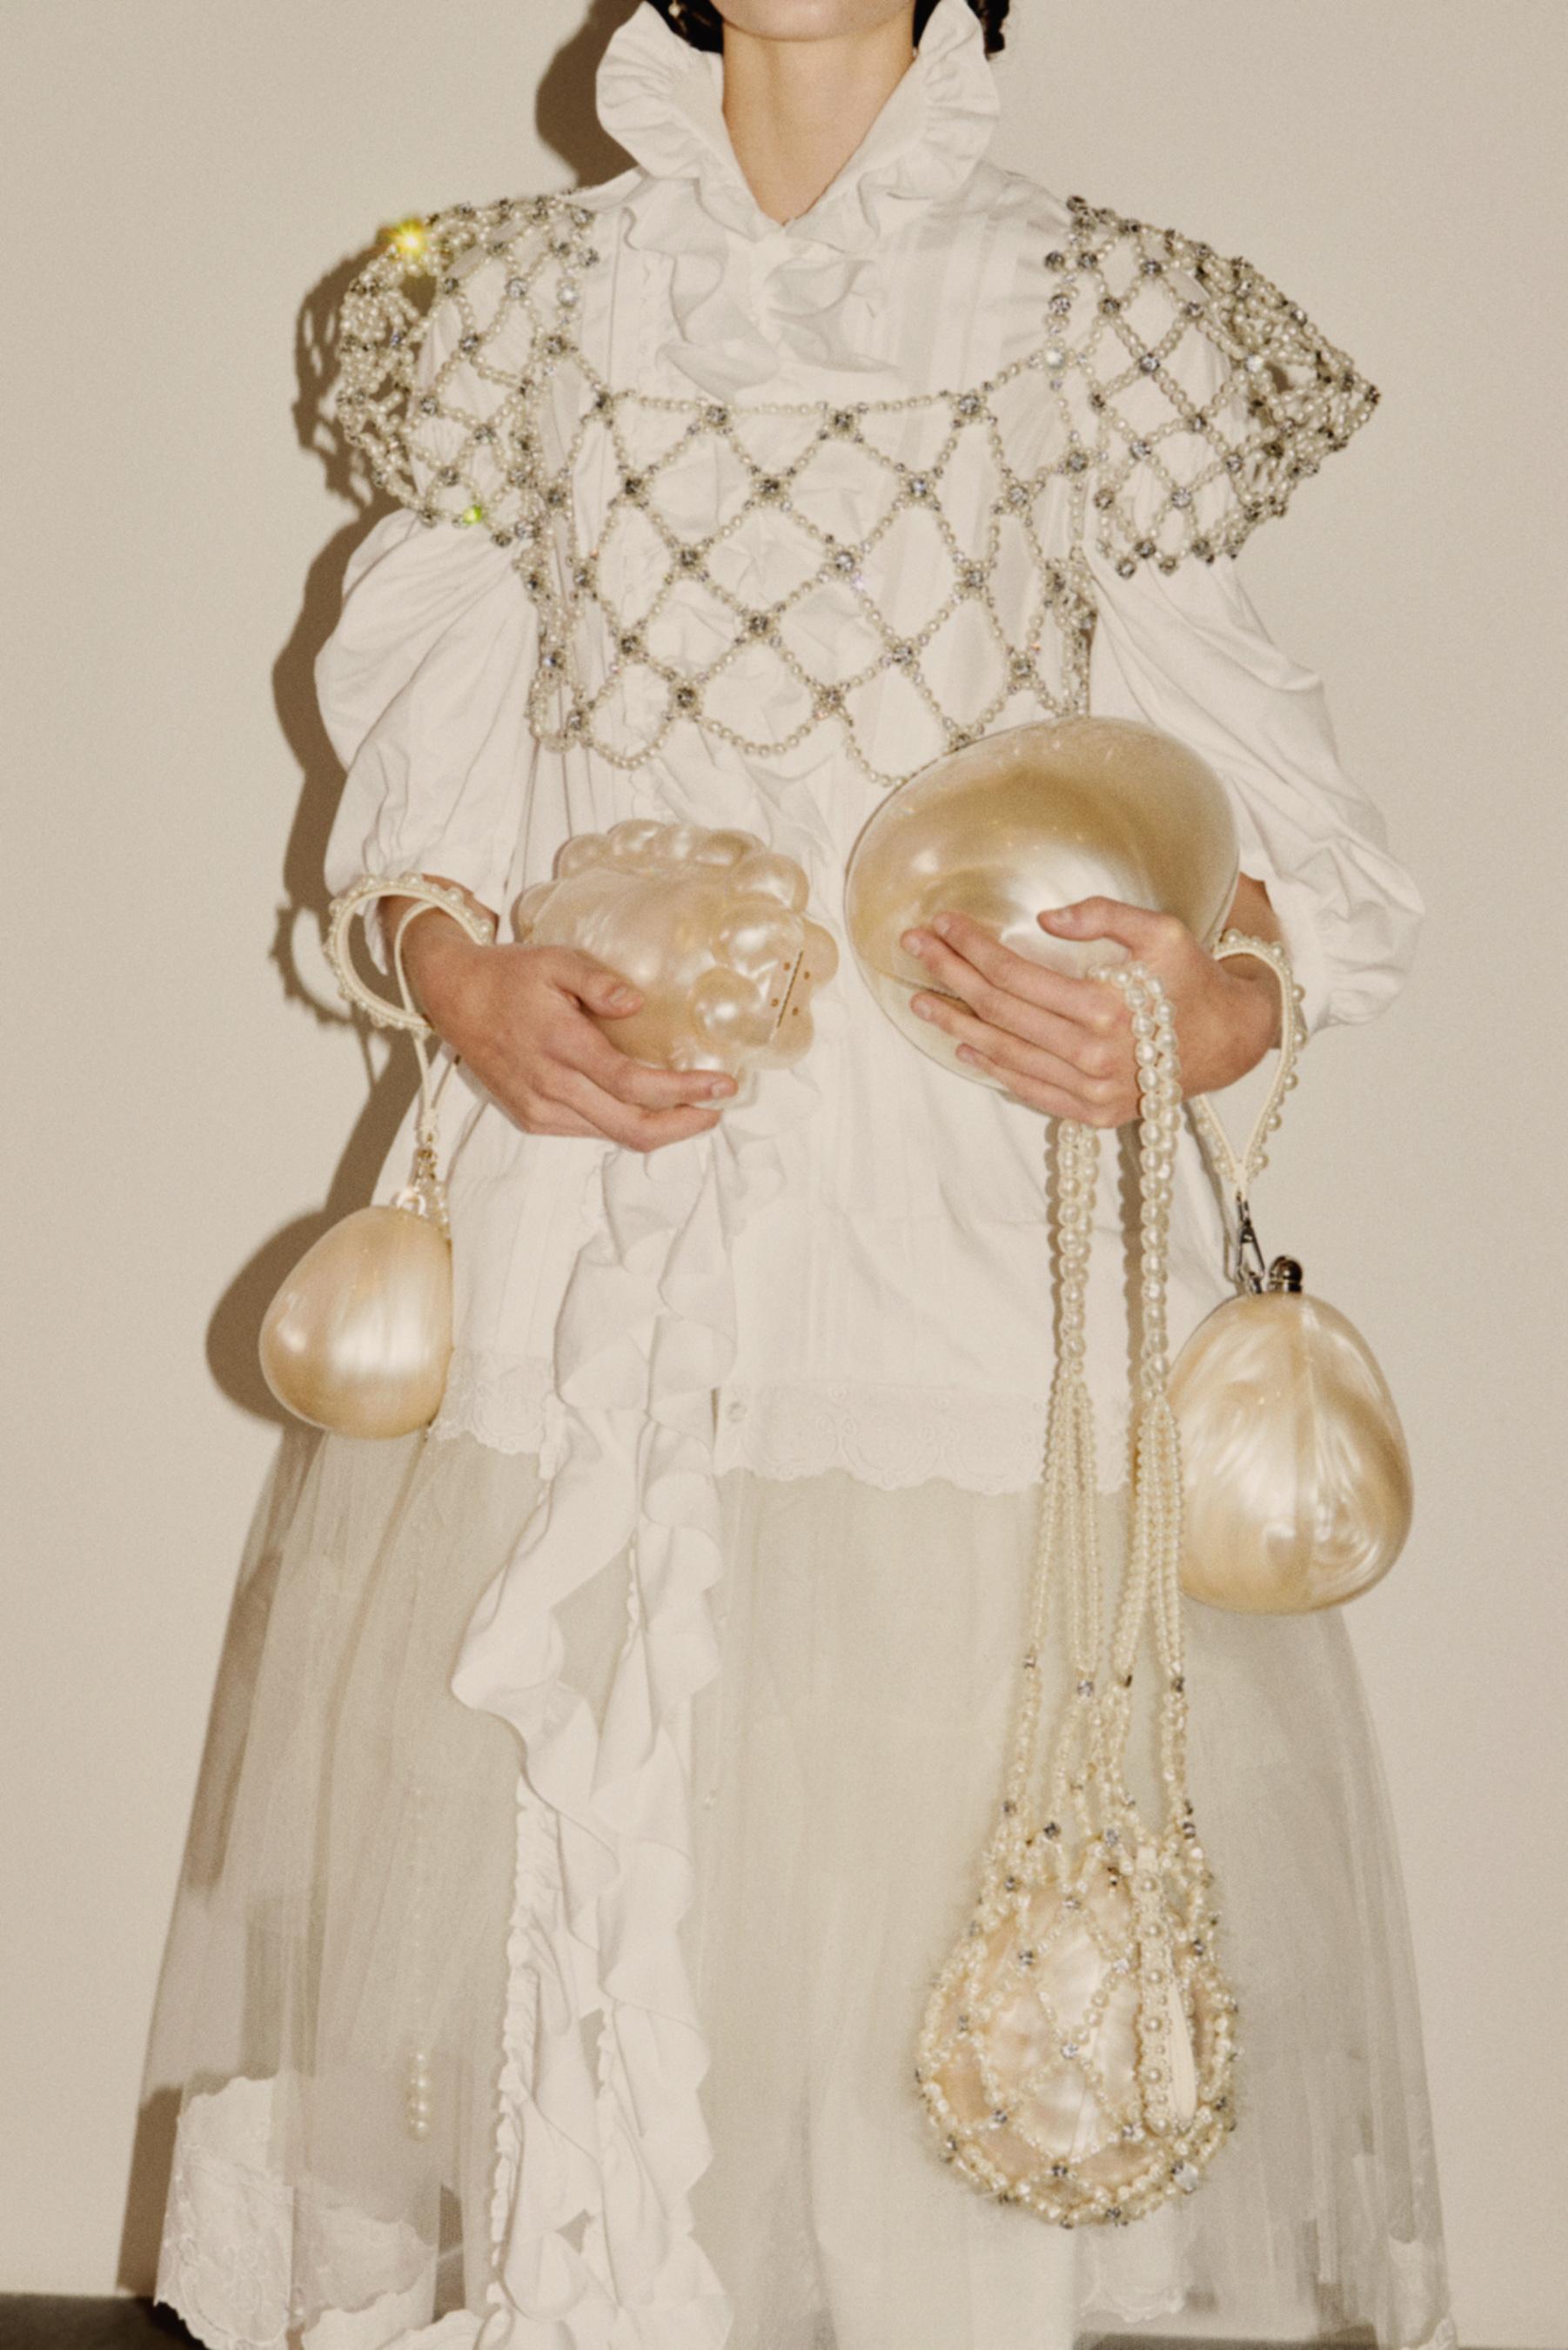 Simone Rocha Spring 2021 Fashion Show Photos